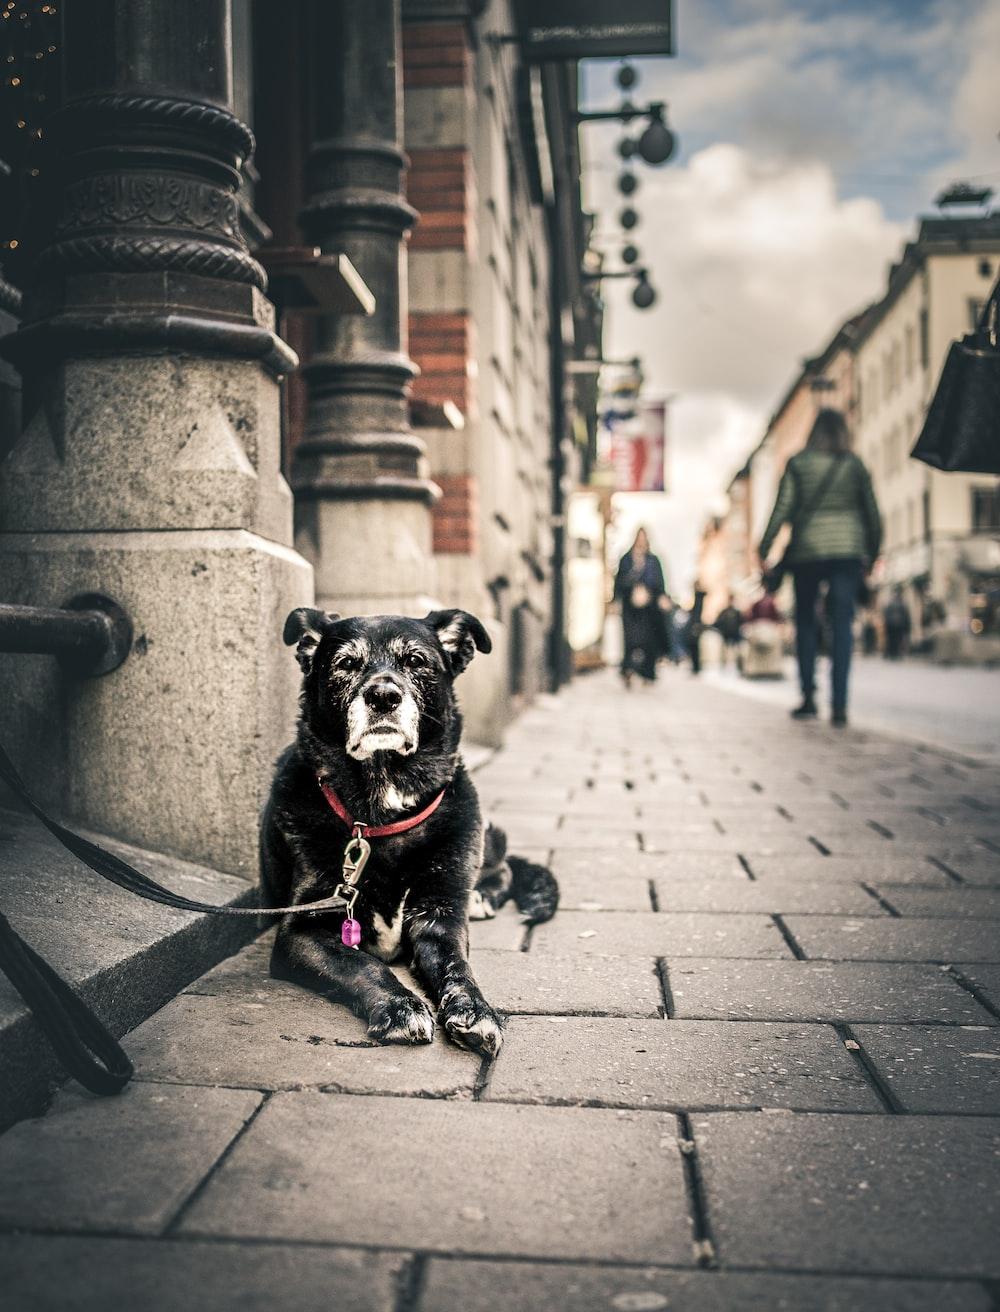 black short coated dog sitting on gray concrete brick floor during daytime